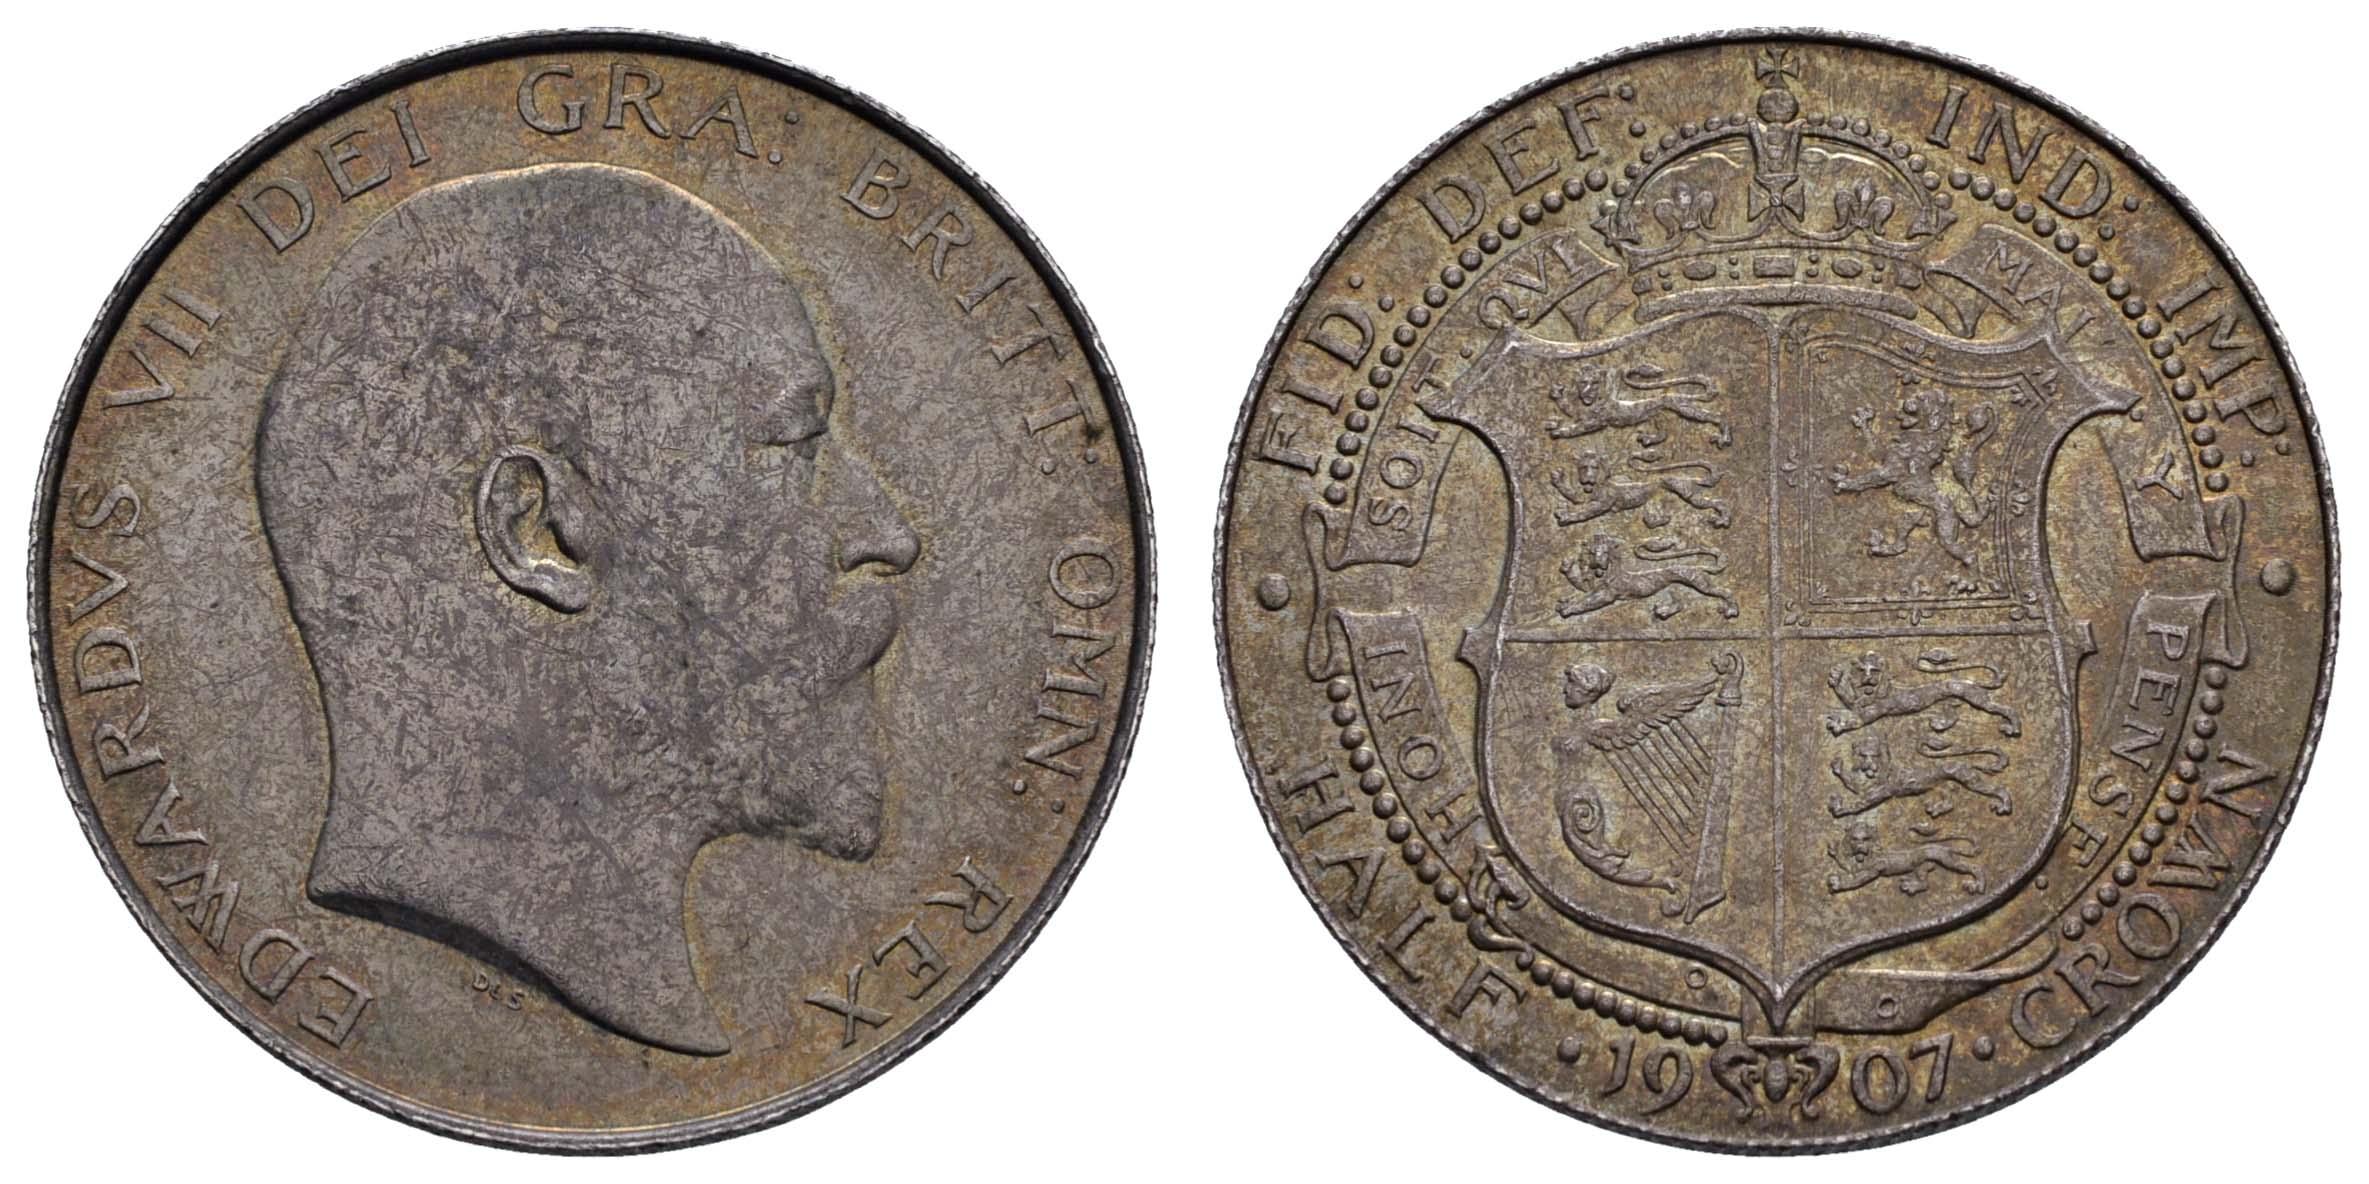 Lot 1597 - europa ab 1800 - Großbritannien -  Auktionshaus Ulrich Felzmann GmbH & Co. KG Coins single lots